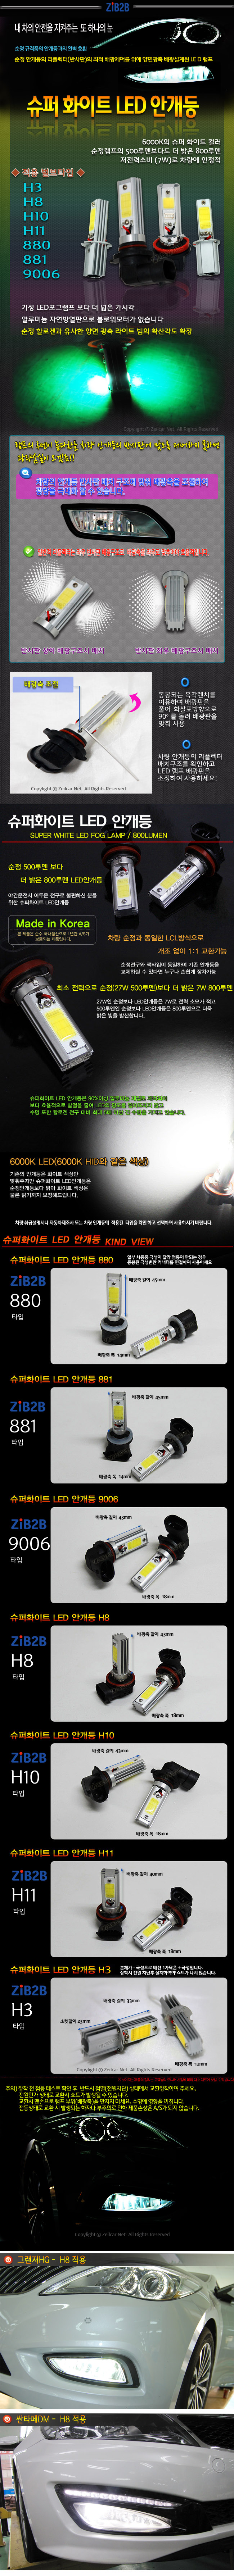 [ZiB2B] 슈퍼화이트 LED포그램프 800루멘 양방향, 프리미엄 LED안개등 - H3 타입 [Zi0798]